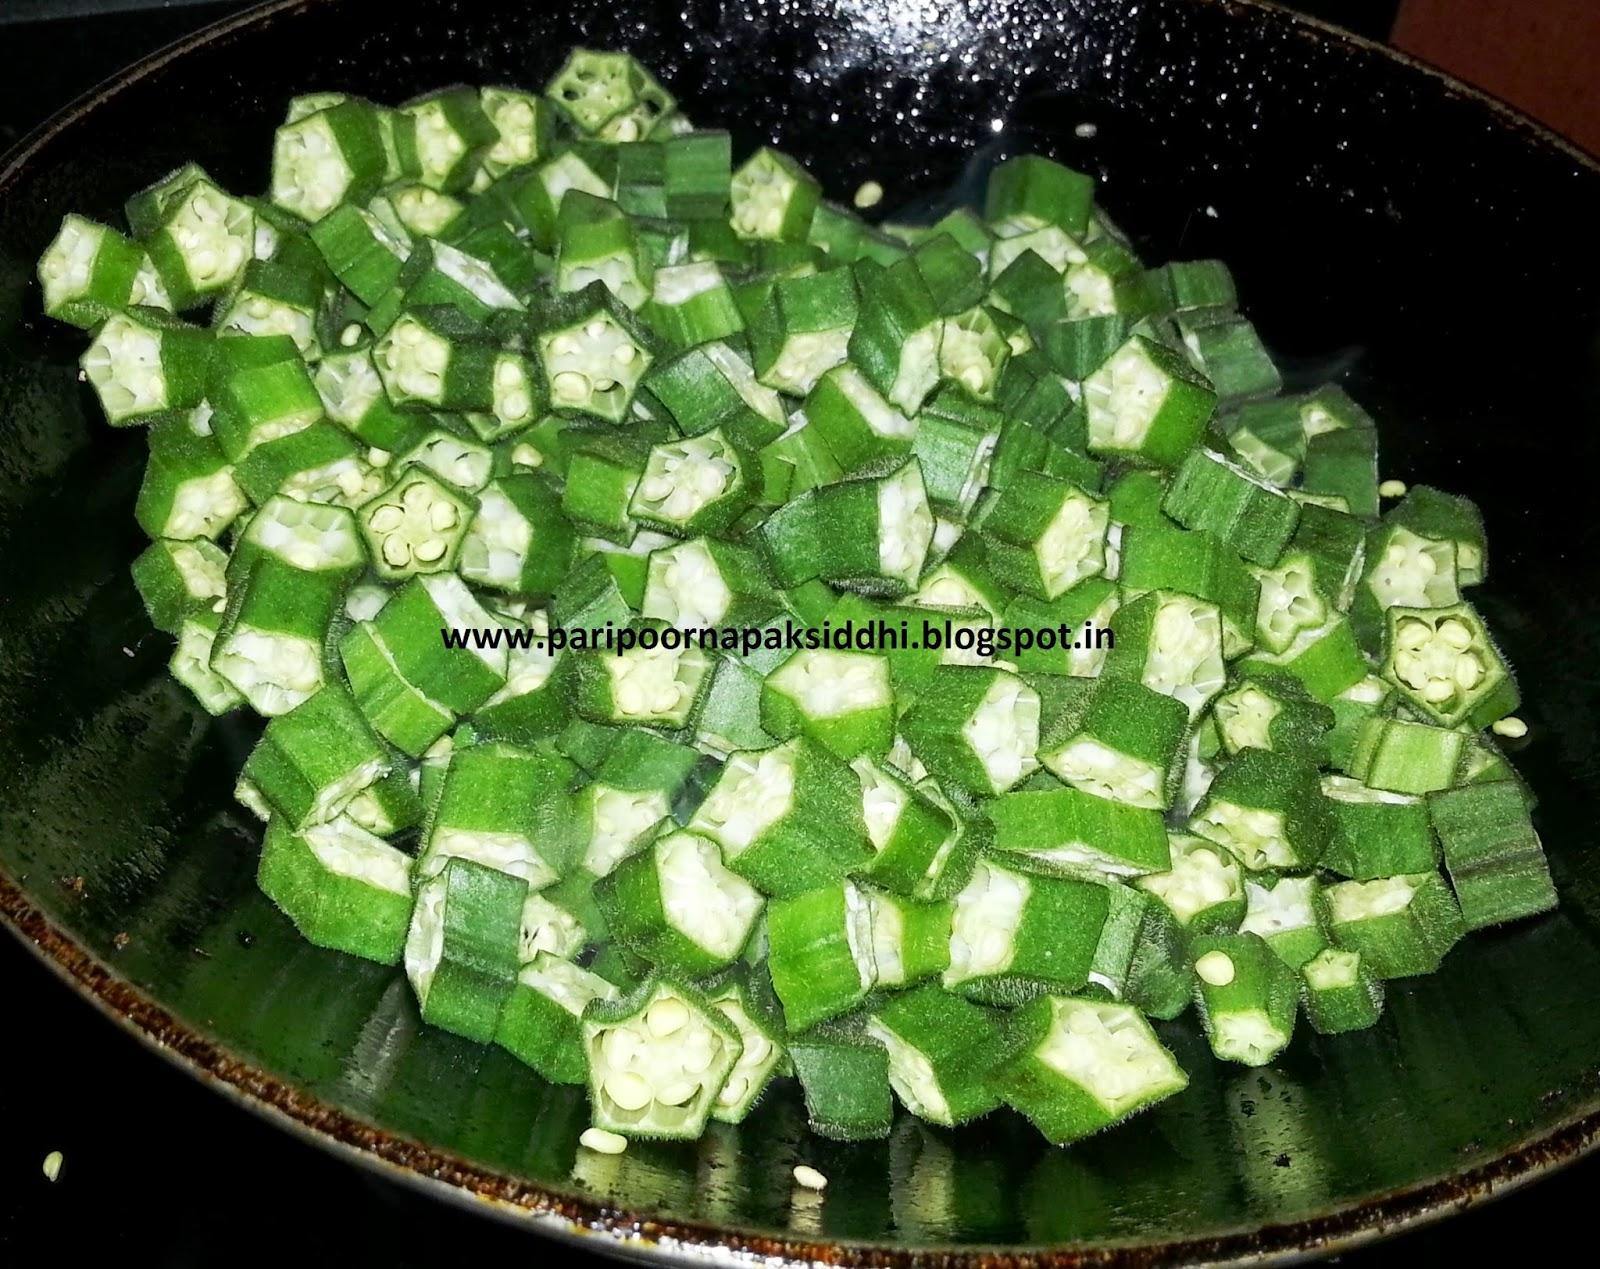 Paripoorna Paksiddhi Bhindi Do Pyaza Stir Fried